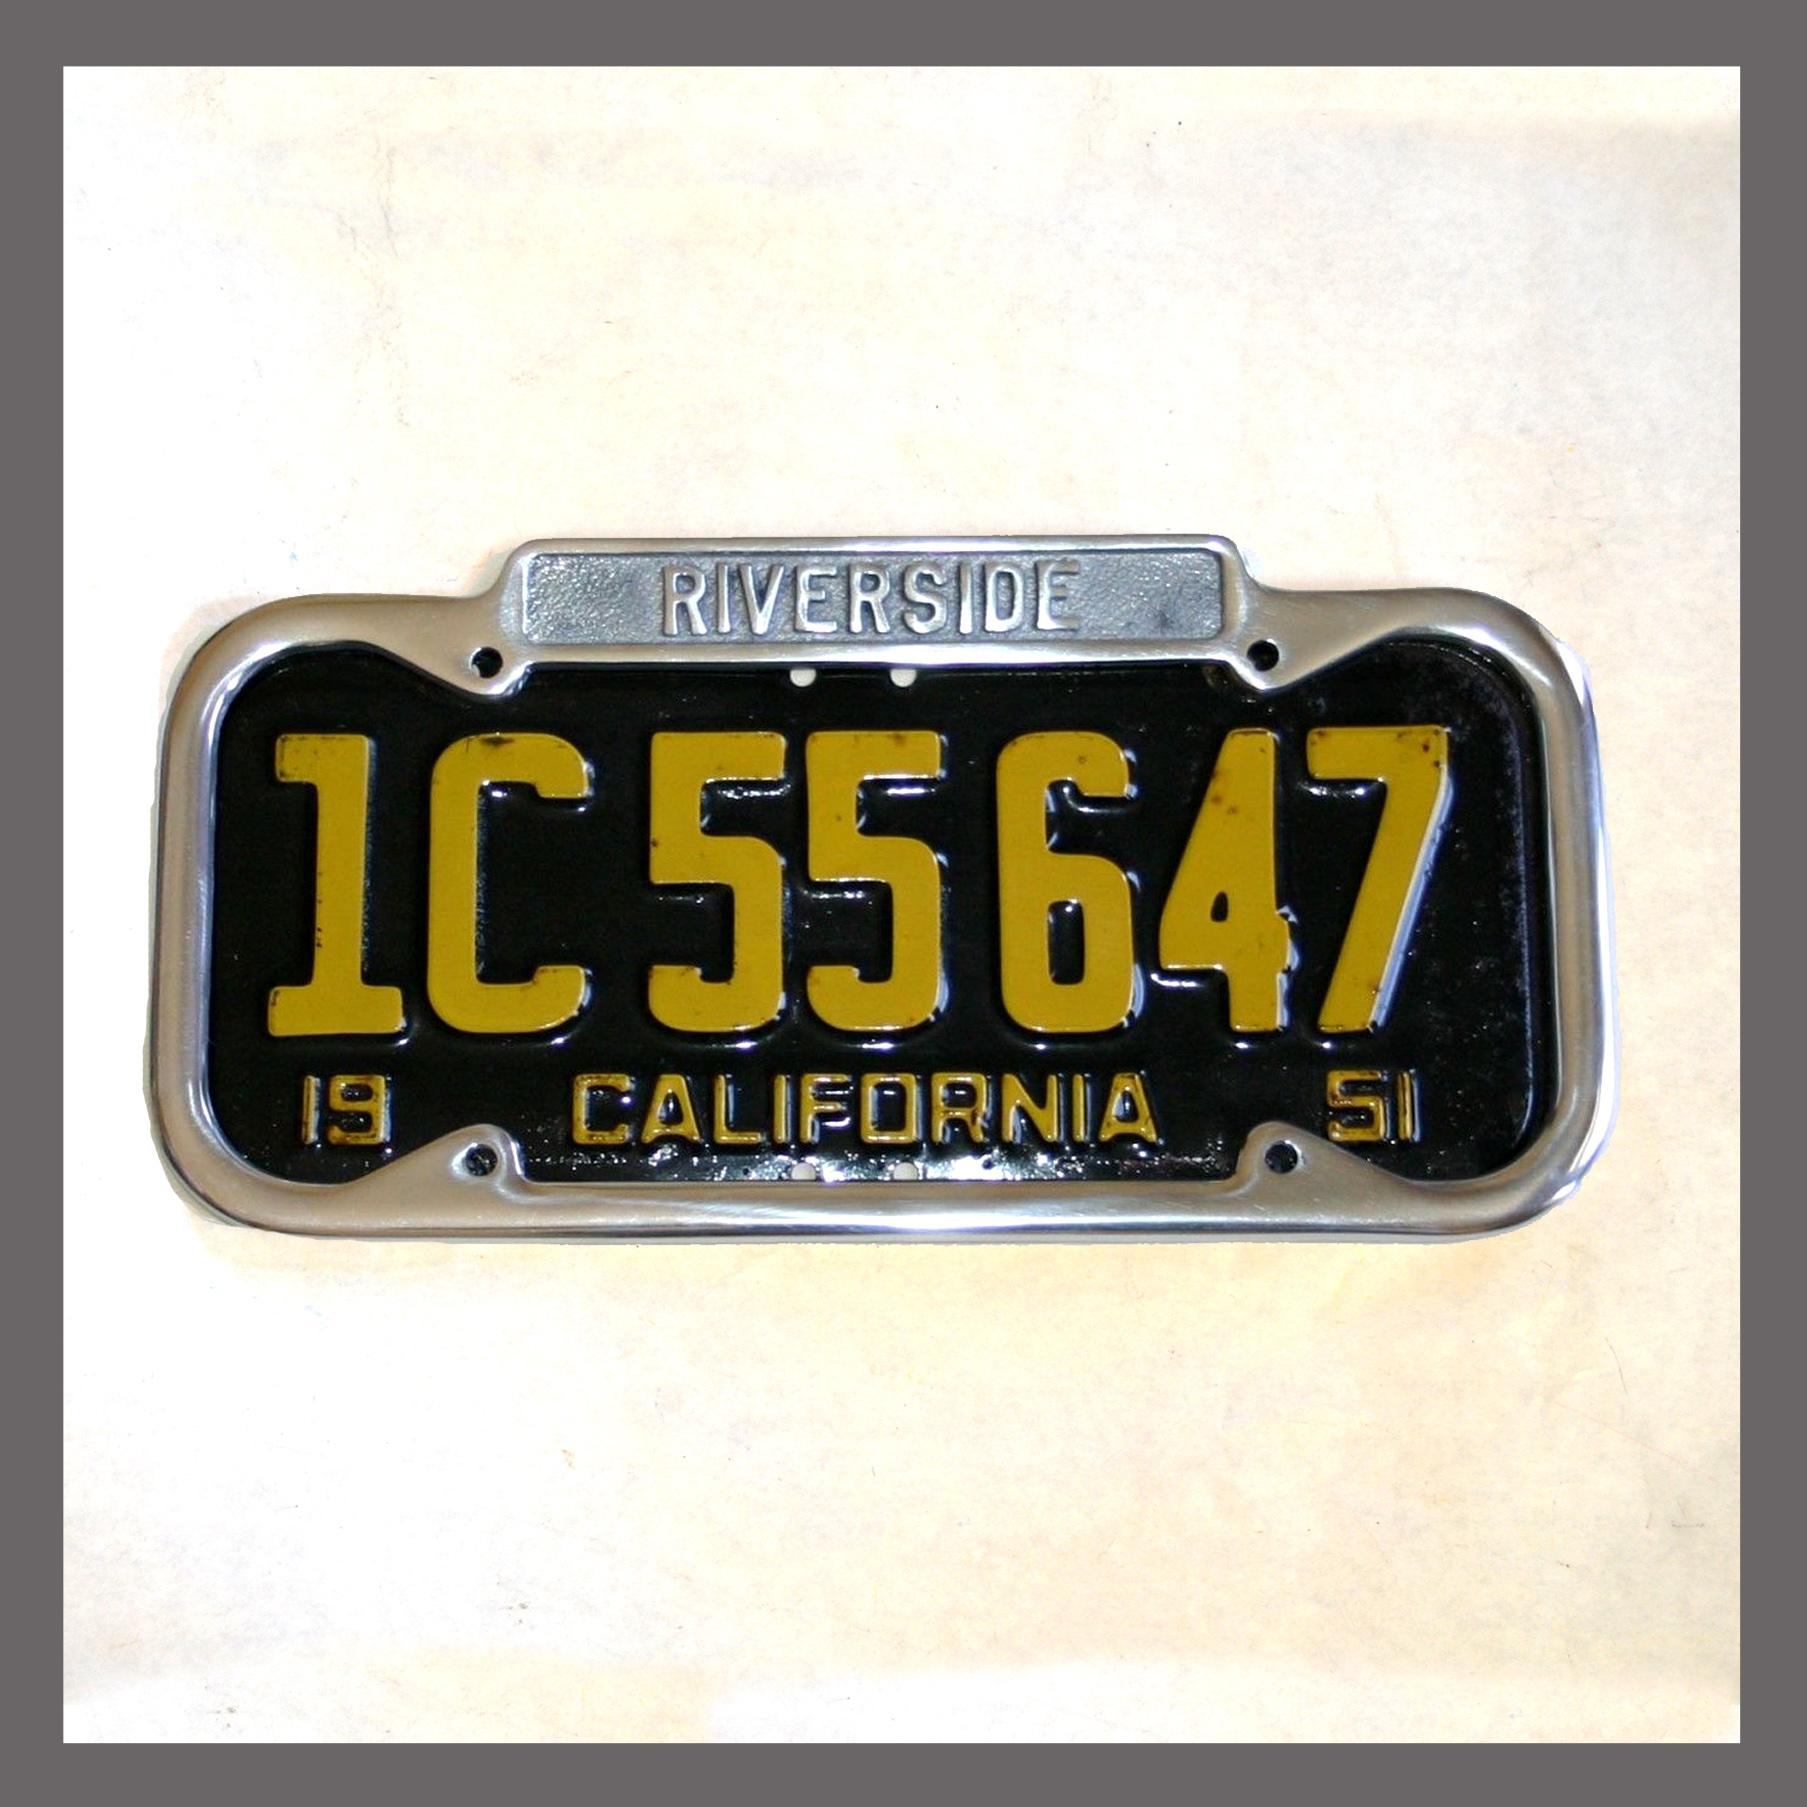 Riverside California Polished License Plate Frame For Sale